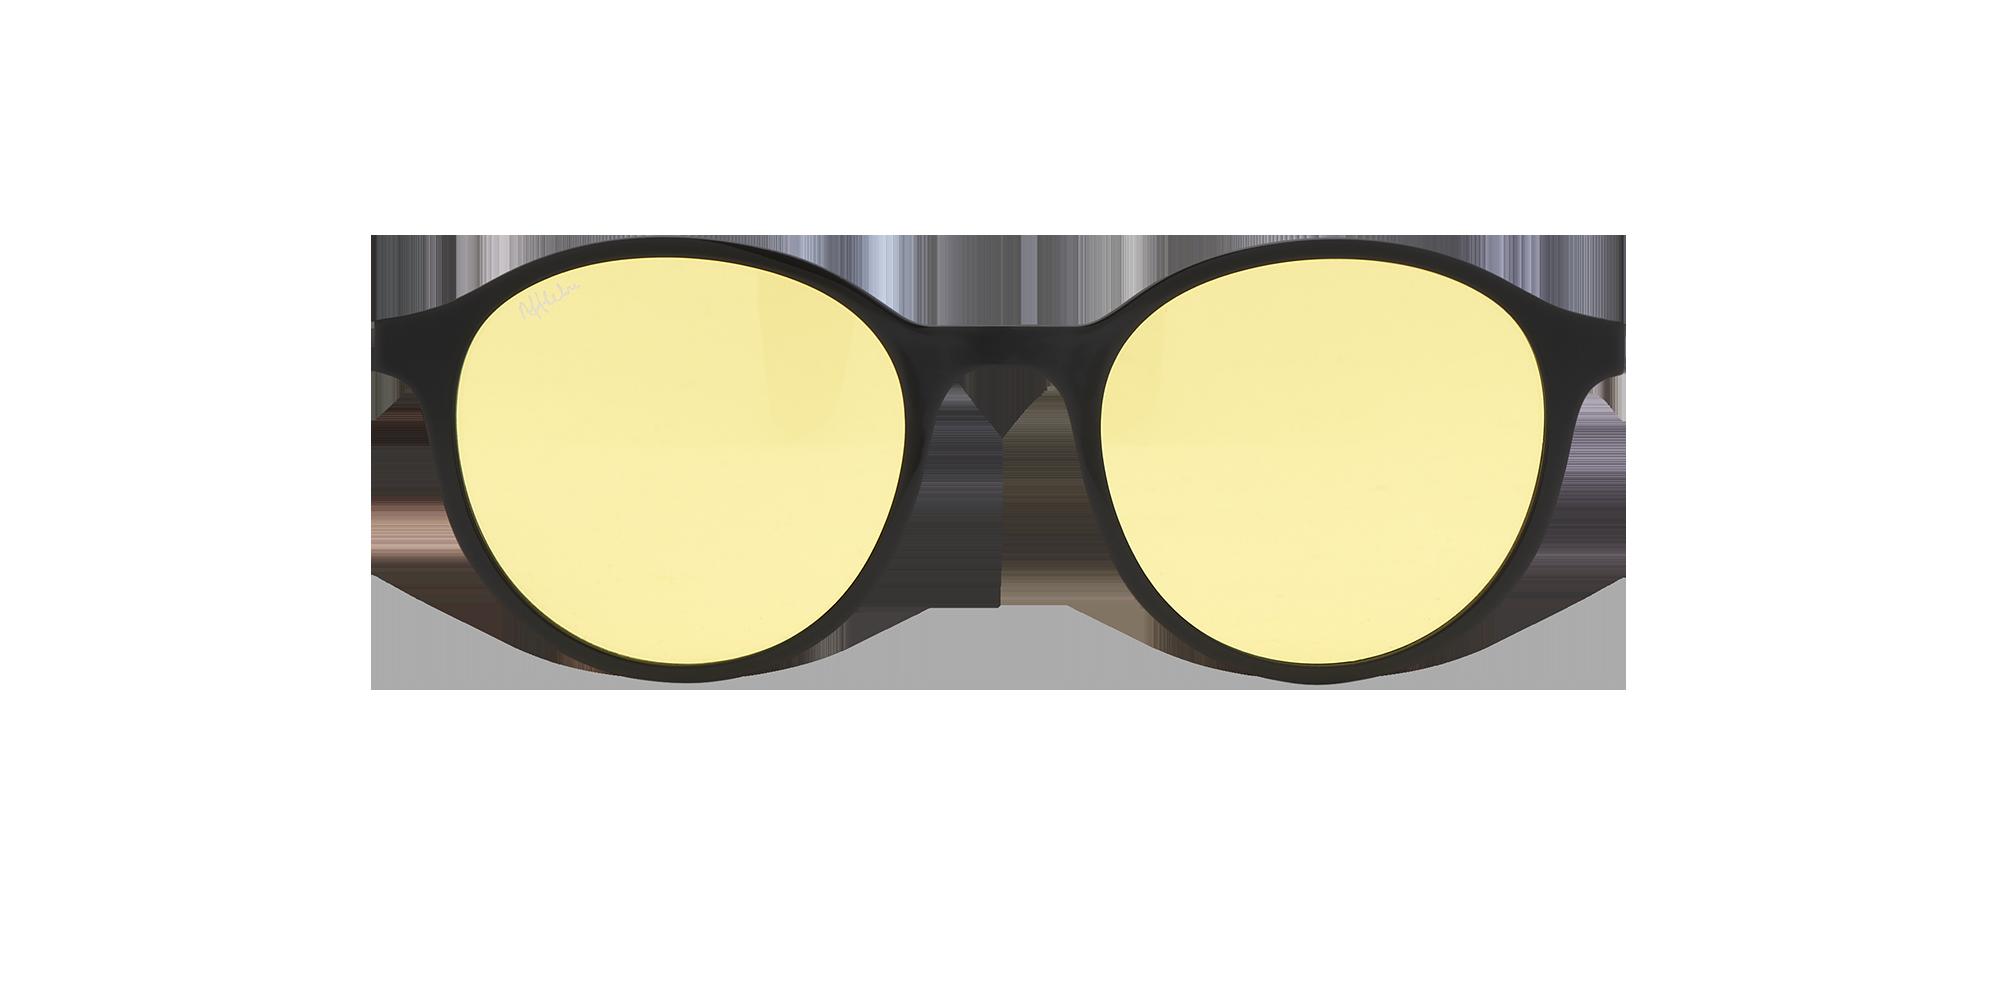 afflelou/france/products/smart_clip/clips_glasses/TMK37YEBK014919.png